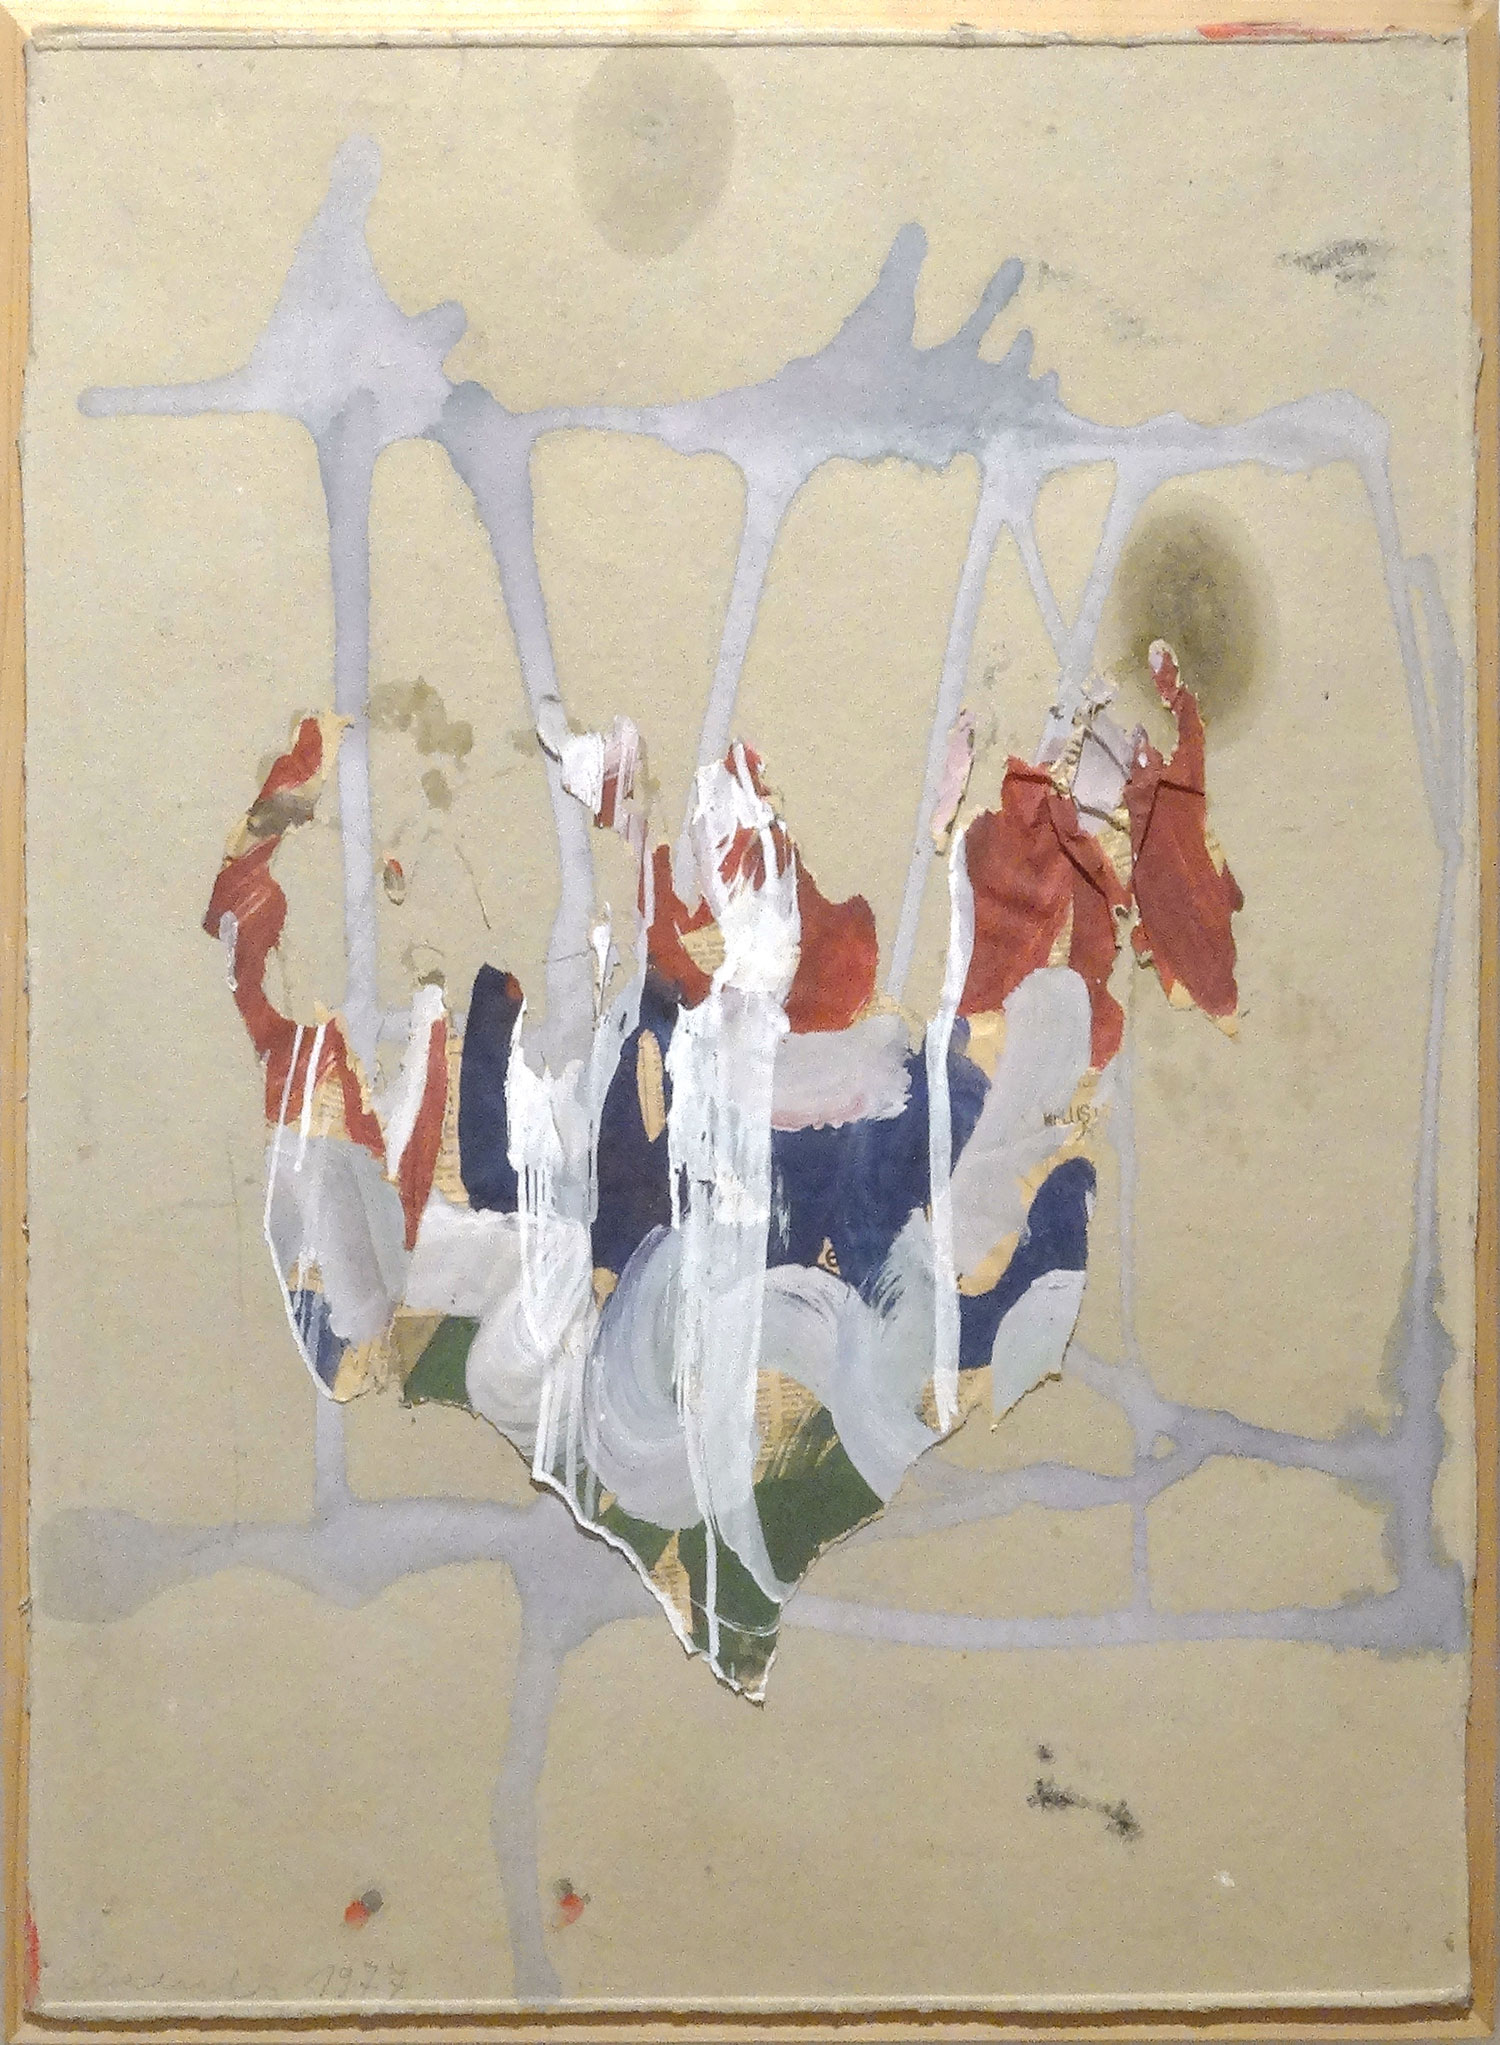 Mondlandschaft 1967  Oswald Oberhuber  Mixed media, collage on cardboard 75 x 55 cm